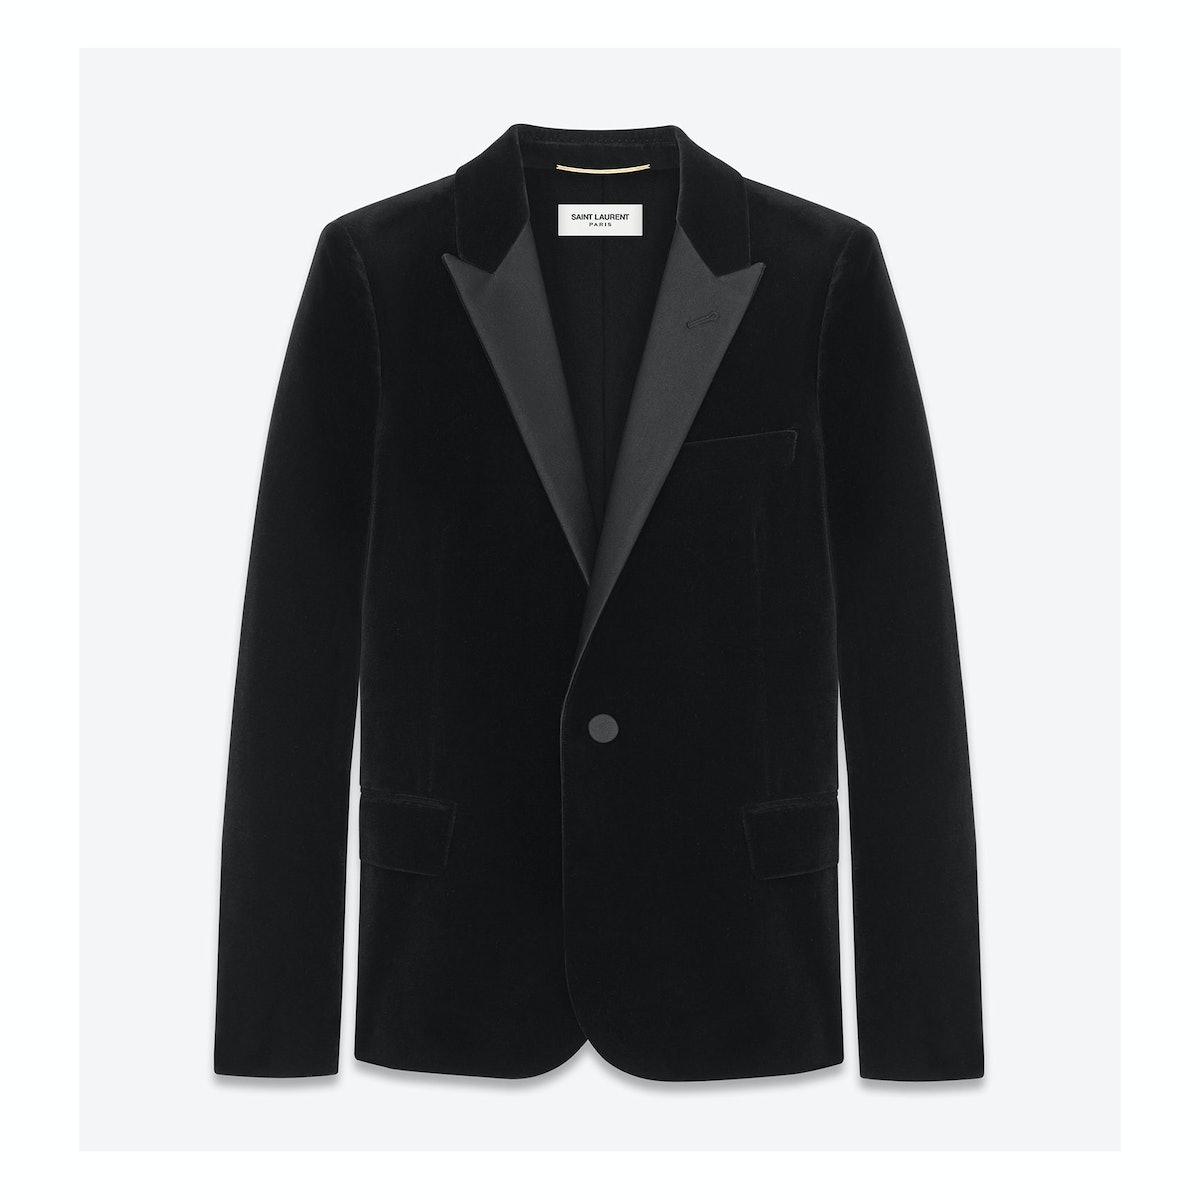 Saint Laurent by Hedi Slimane jacket